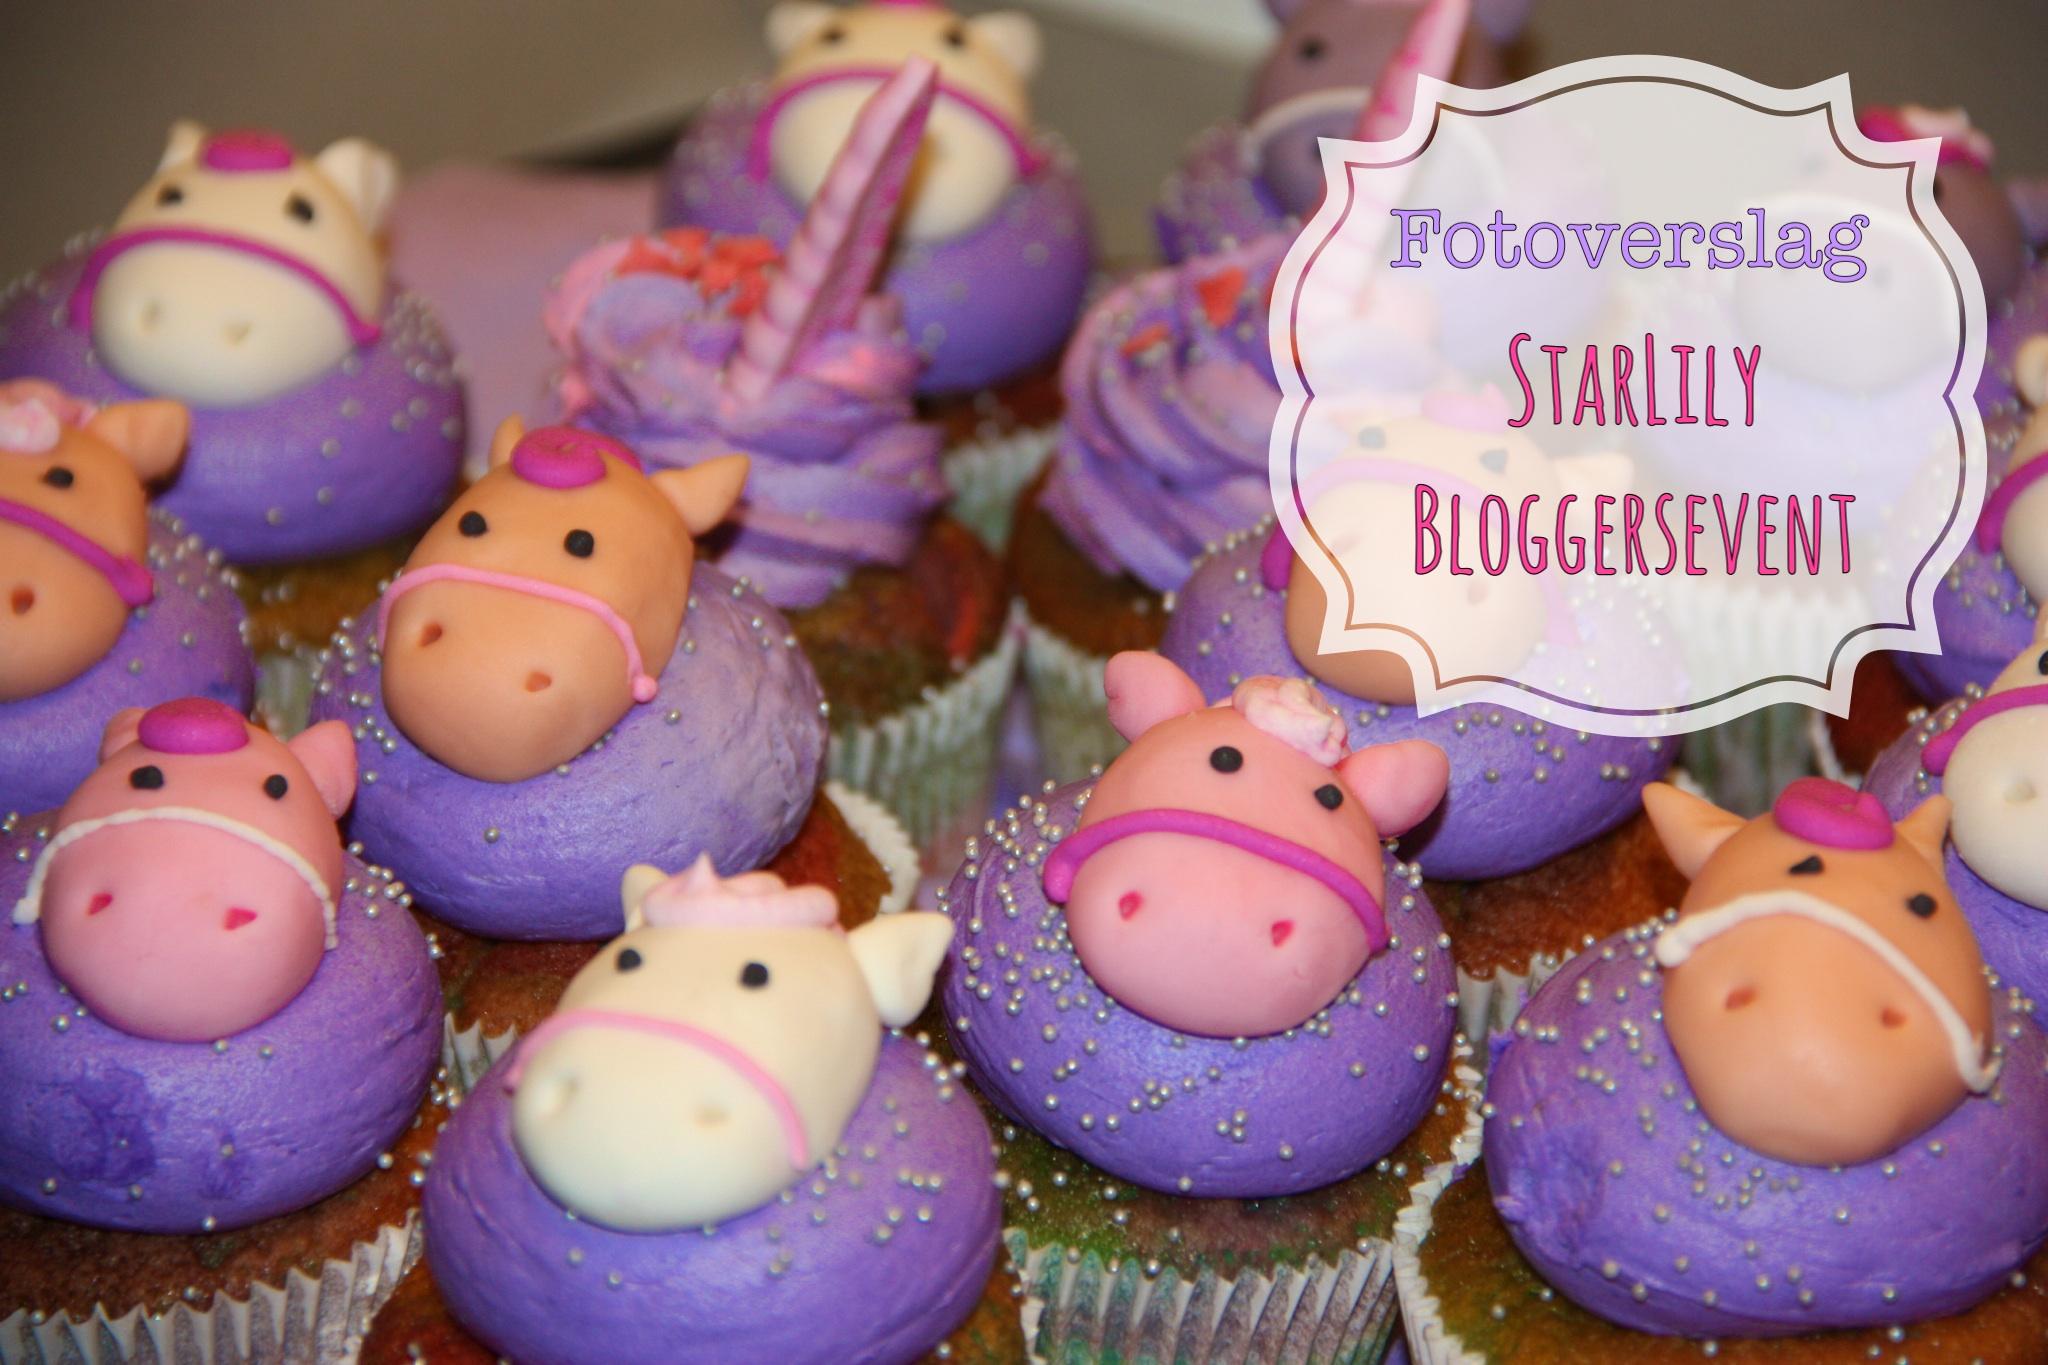 Fotoverslag |  StarLily bloggersevent